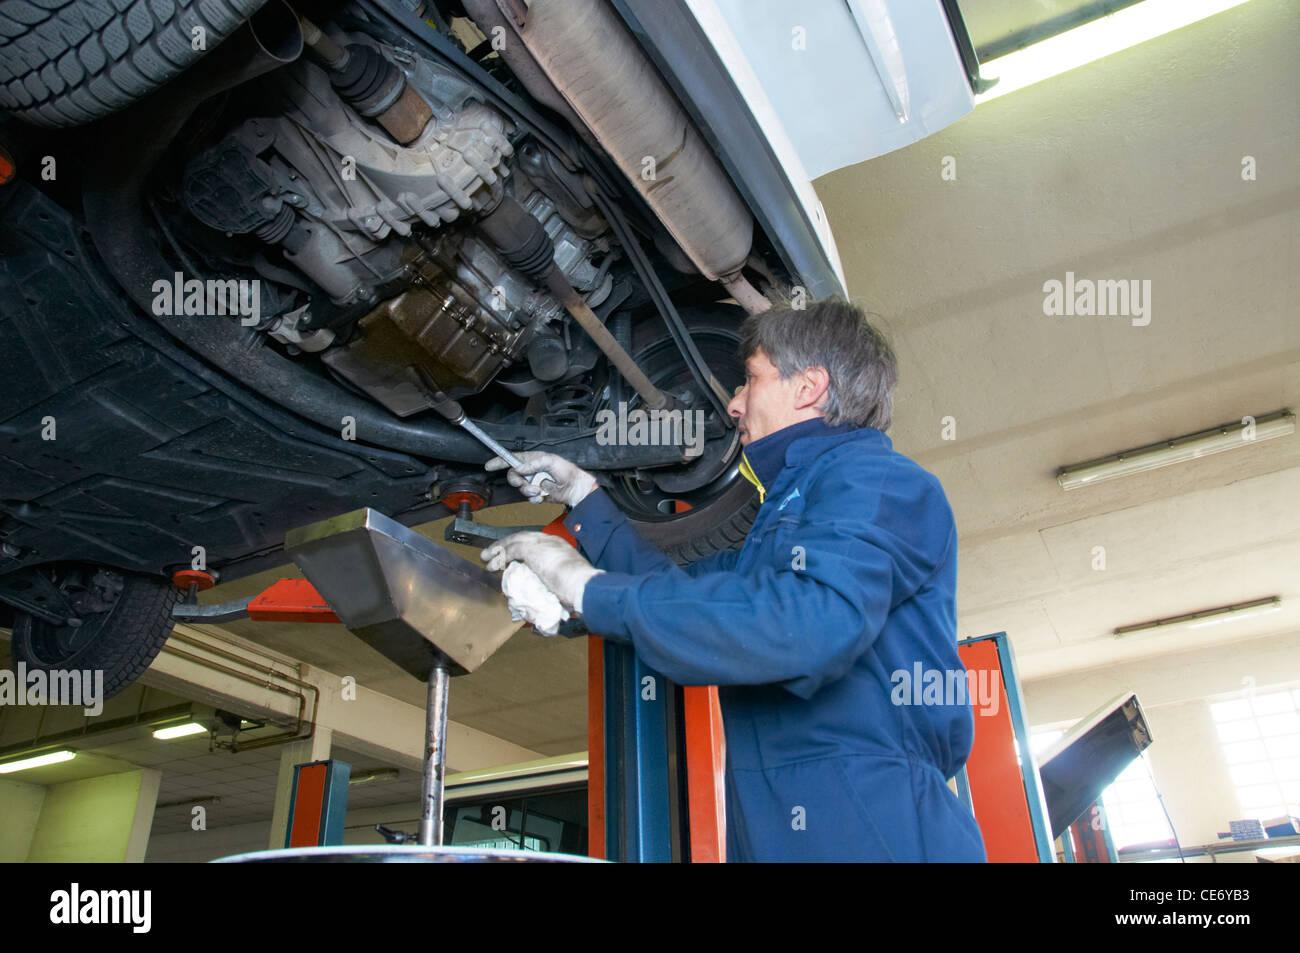 mechanic repairs a car in a garage - Stock Image